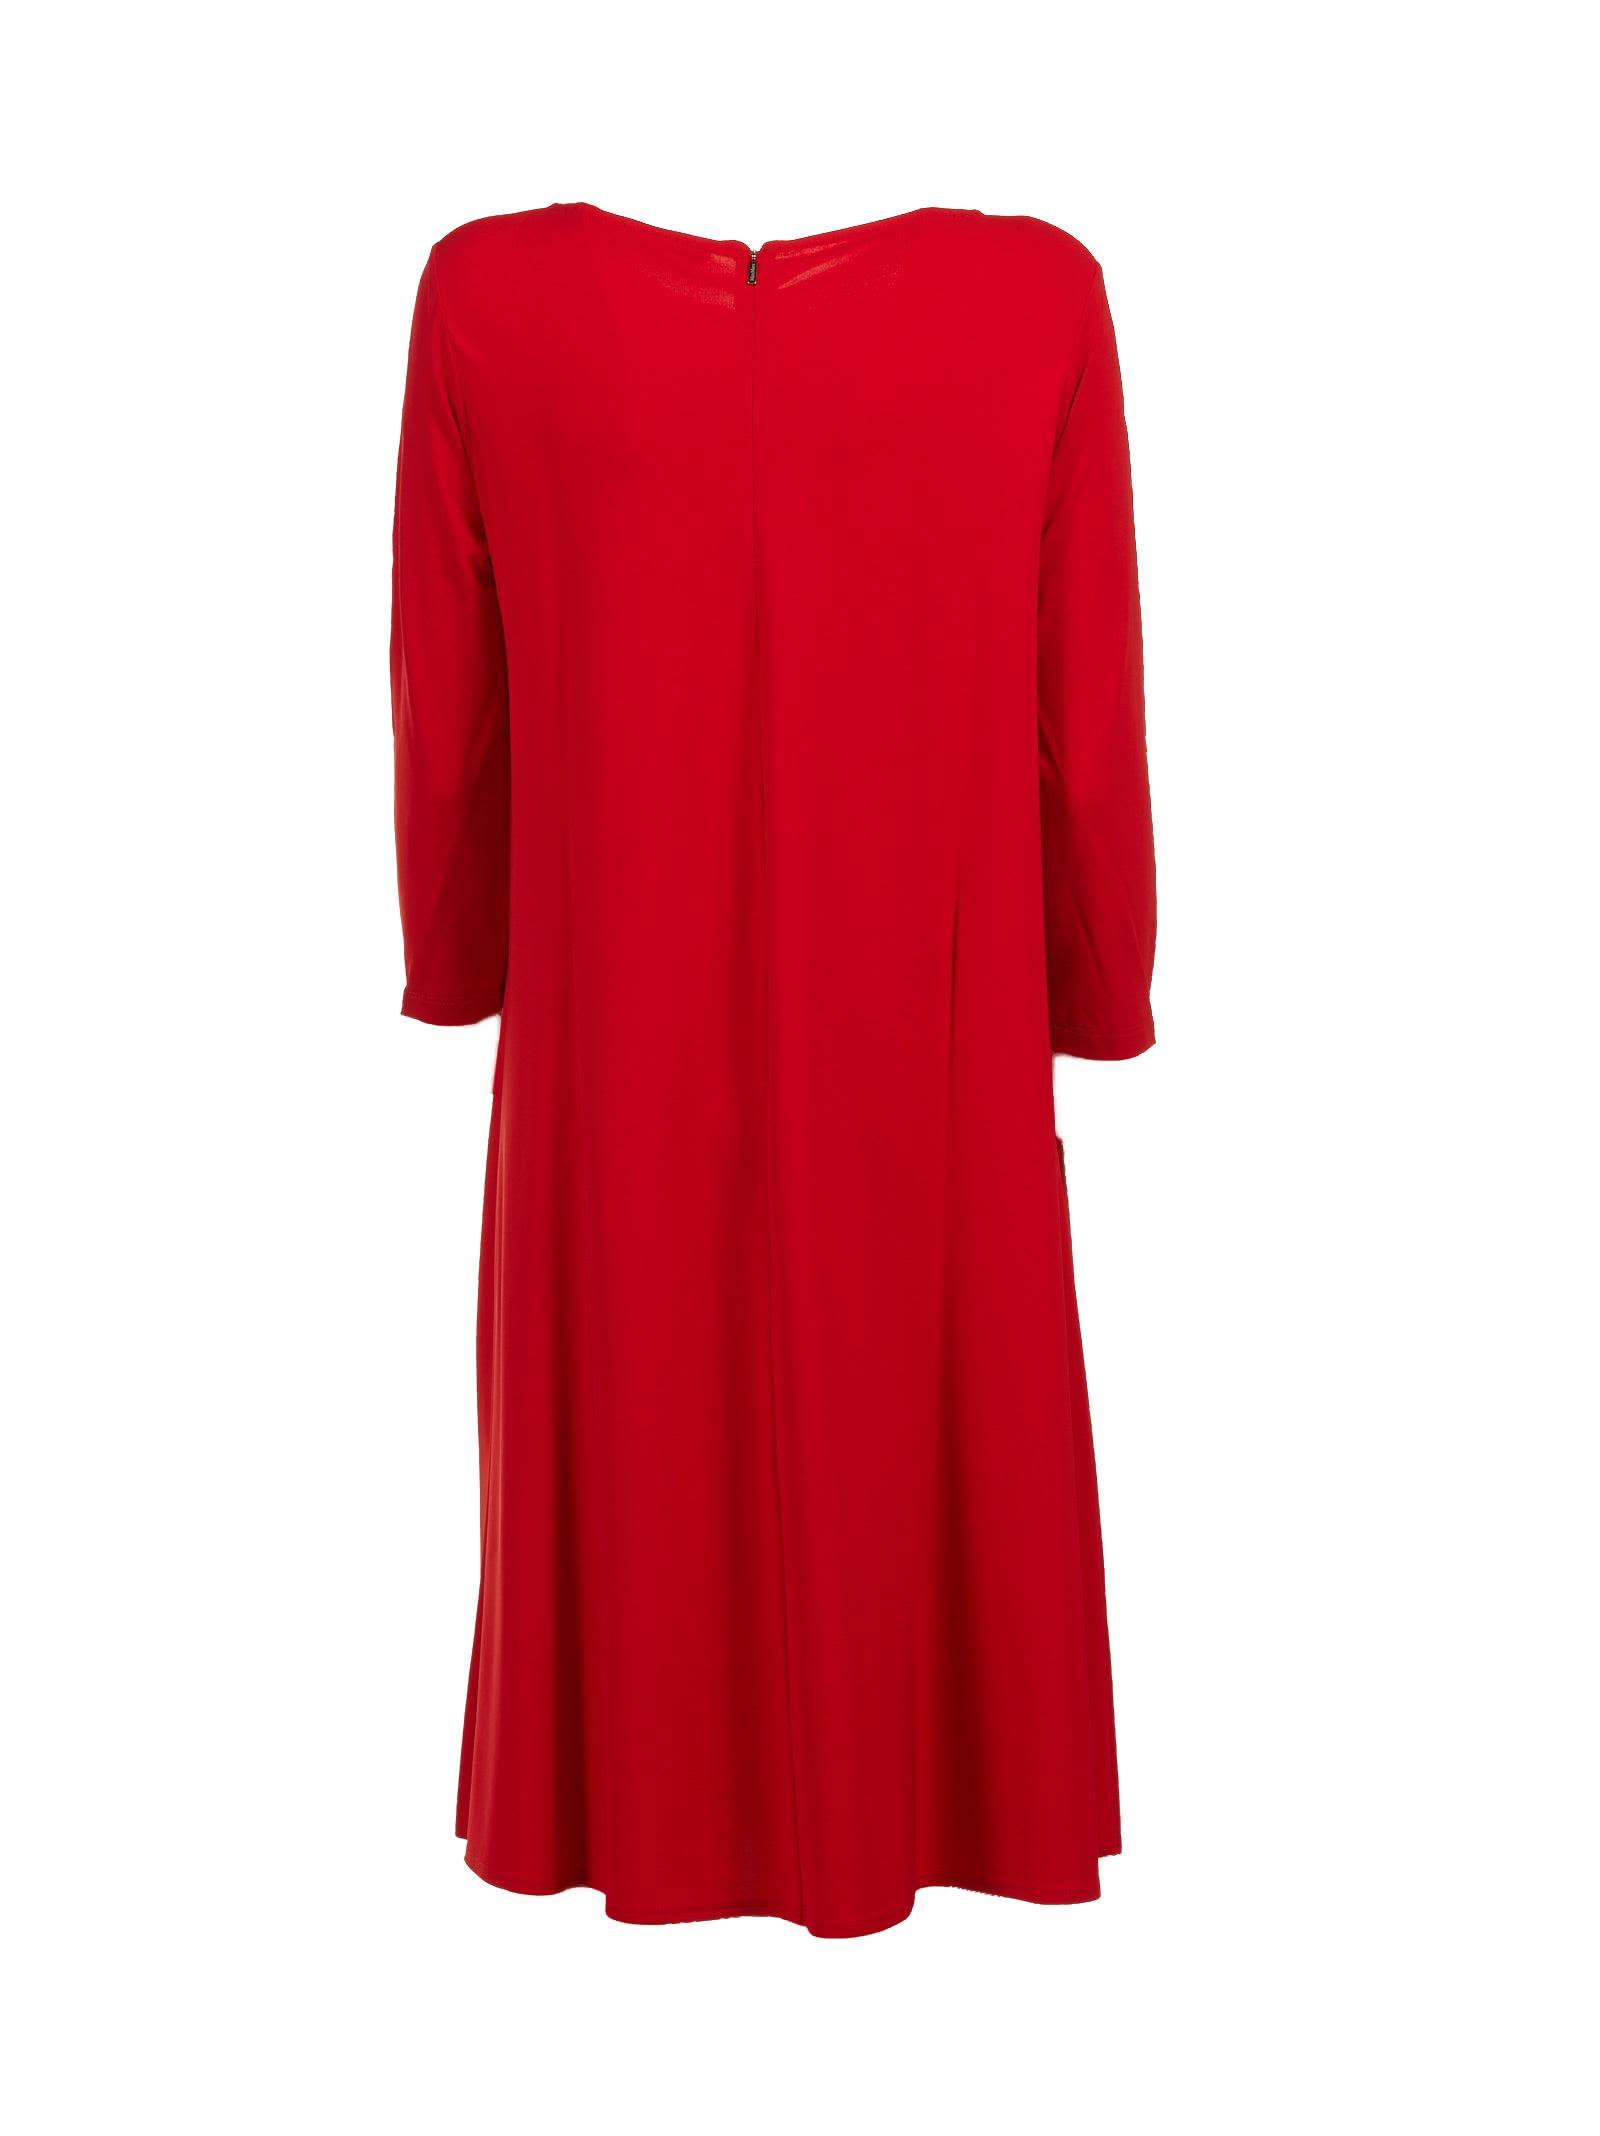 Max Mara flared loose dress Cheap 2018 Newest Avlmt